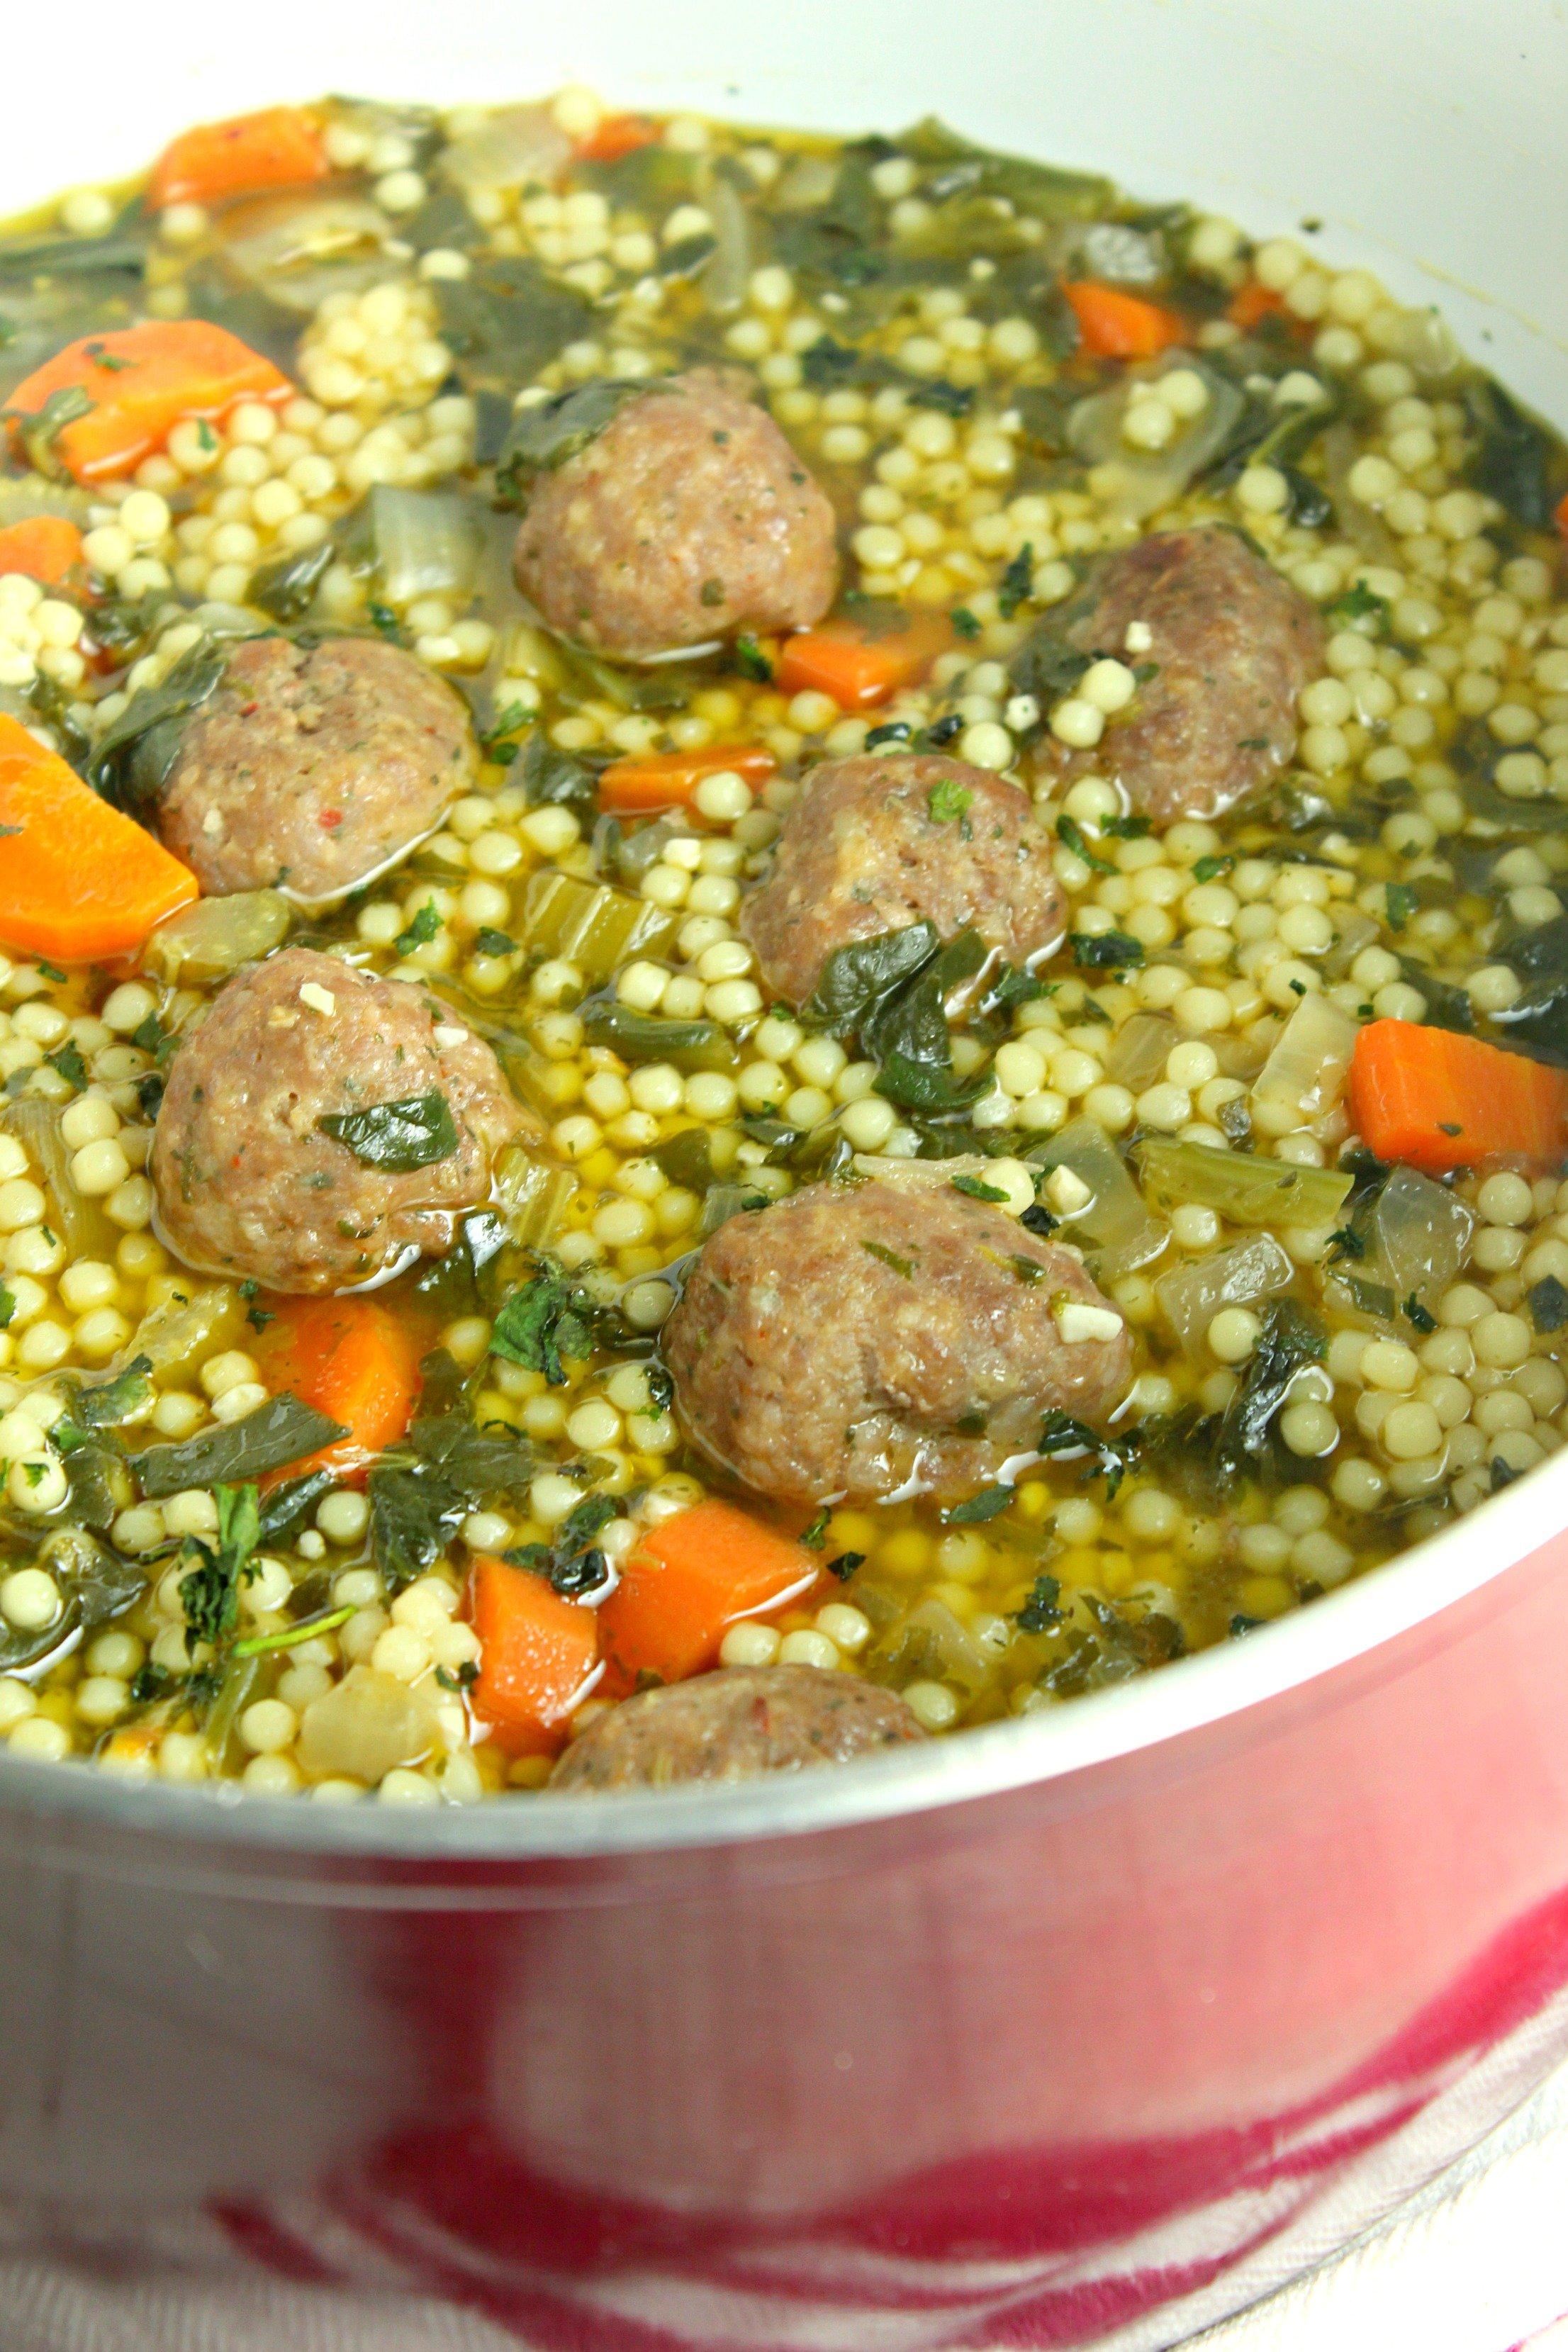 Italian Wedding Soup Can.Italian Wedding Soup